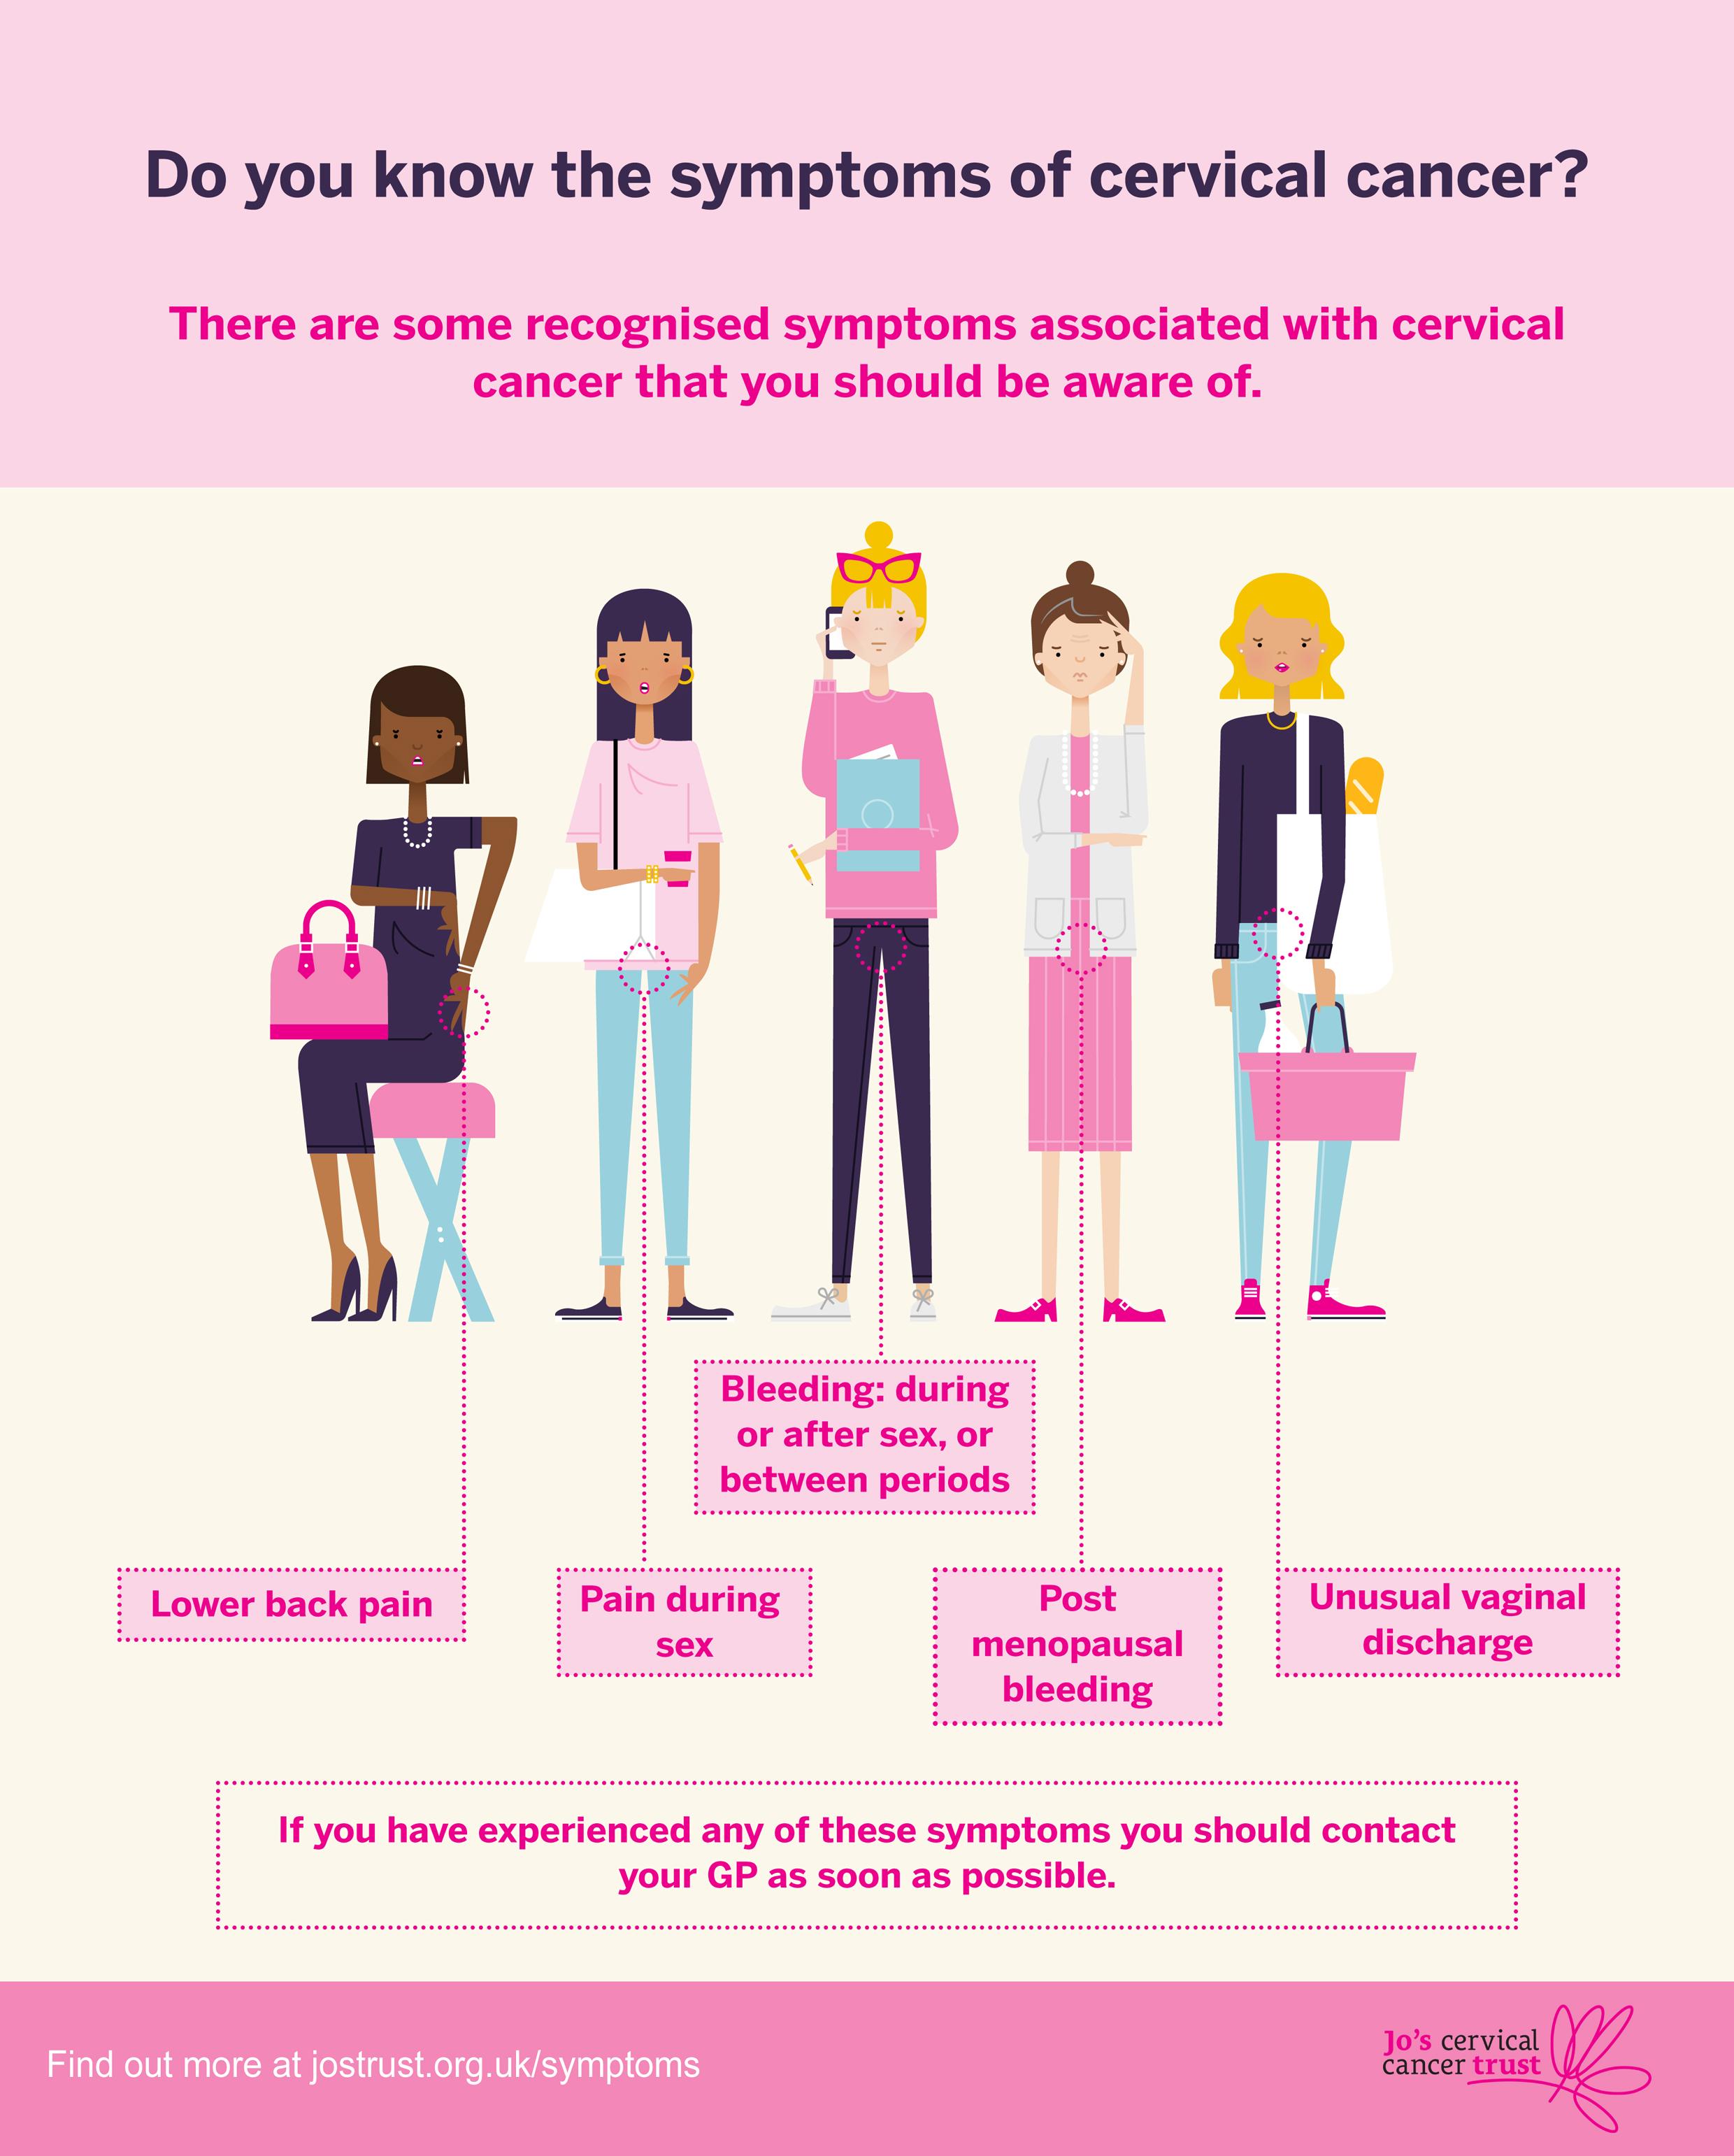 Small cell cervical cancer | Jo's Cervical Cancer Trust